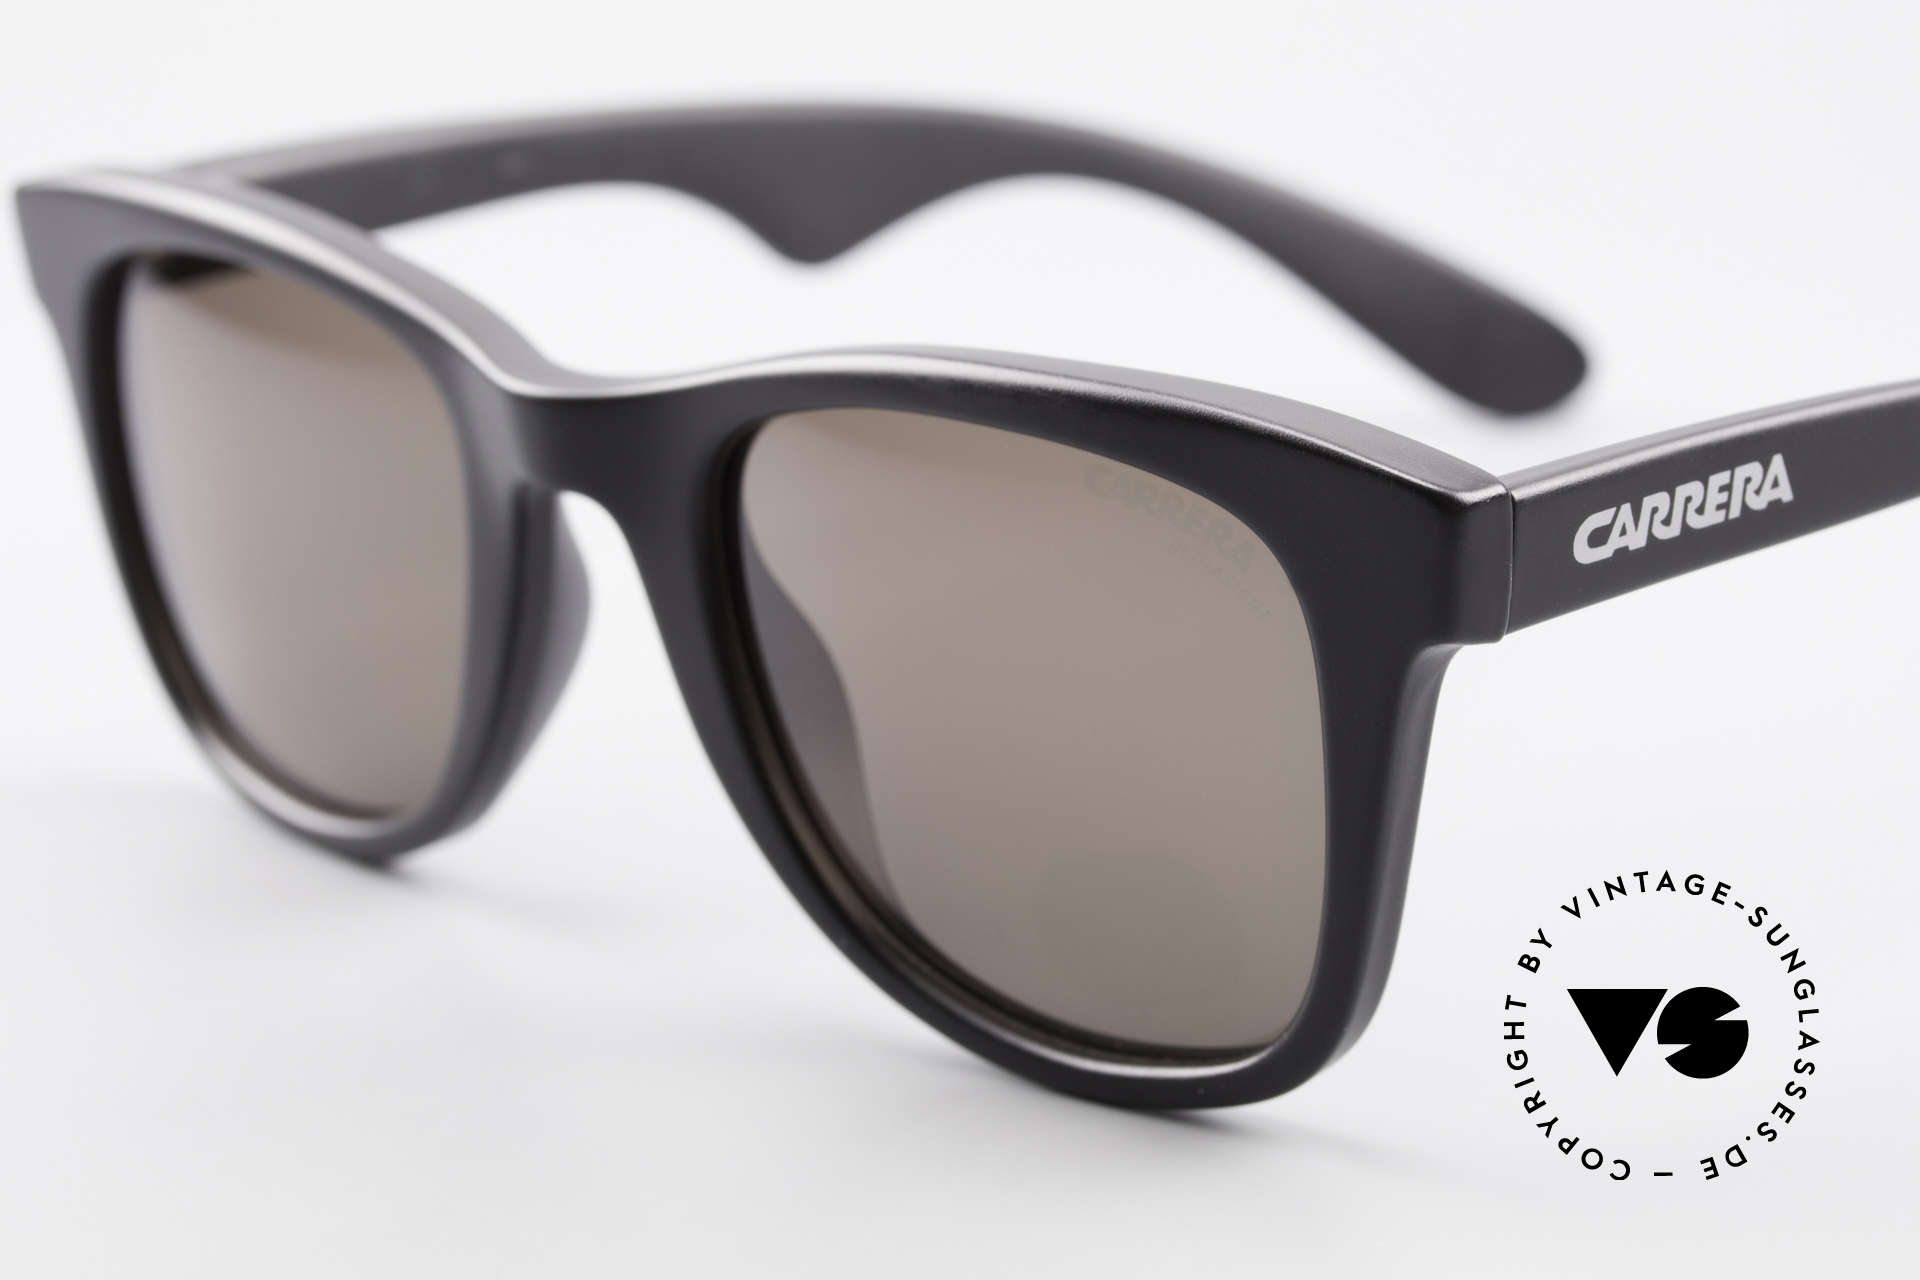 07e92a21e Sunglasses Carrera 5447 90's Sunglasses Wayfarer Style | Vintage ...